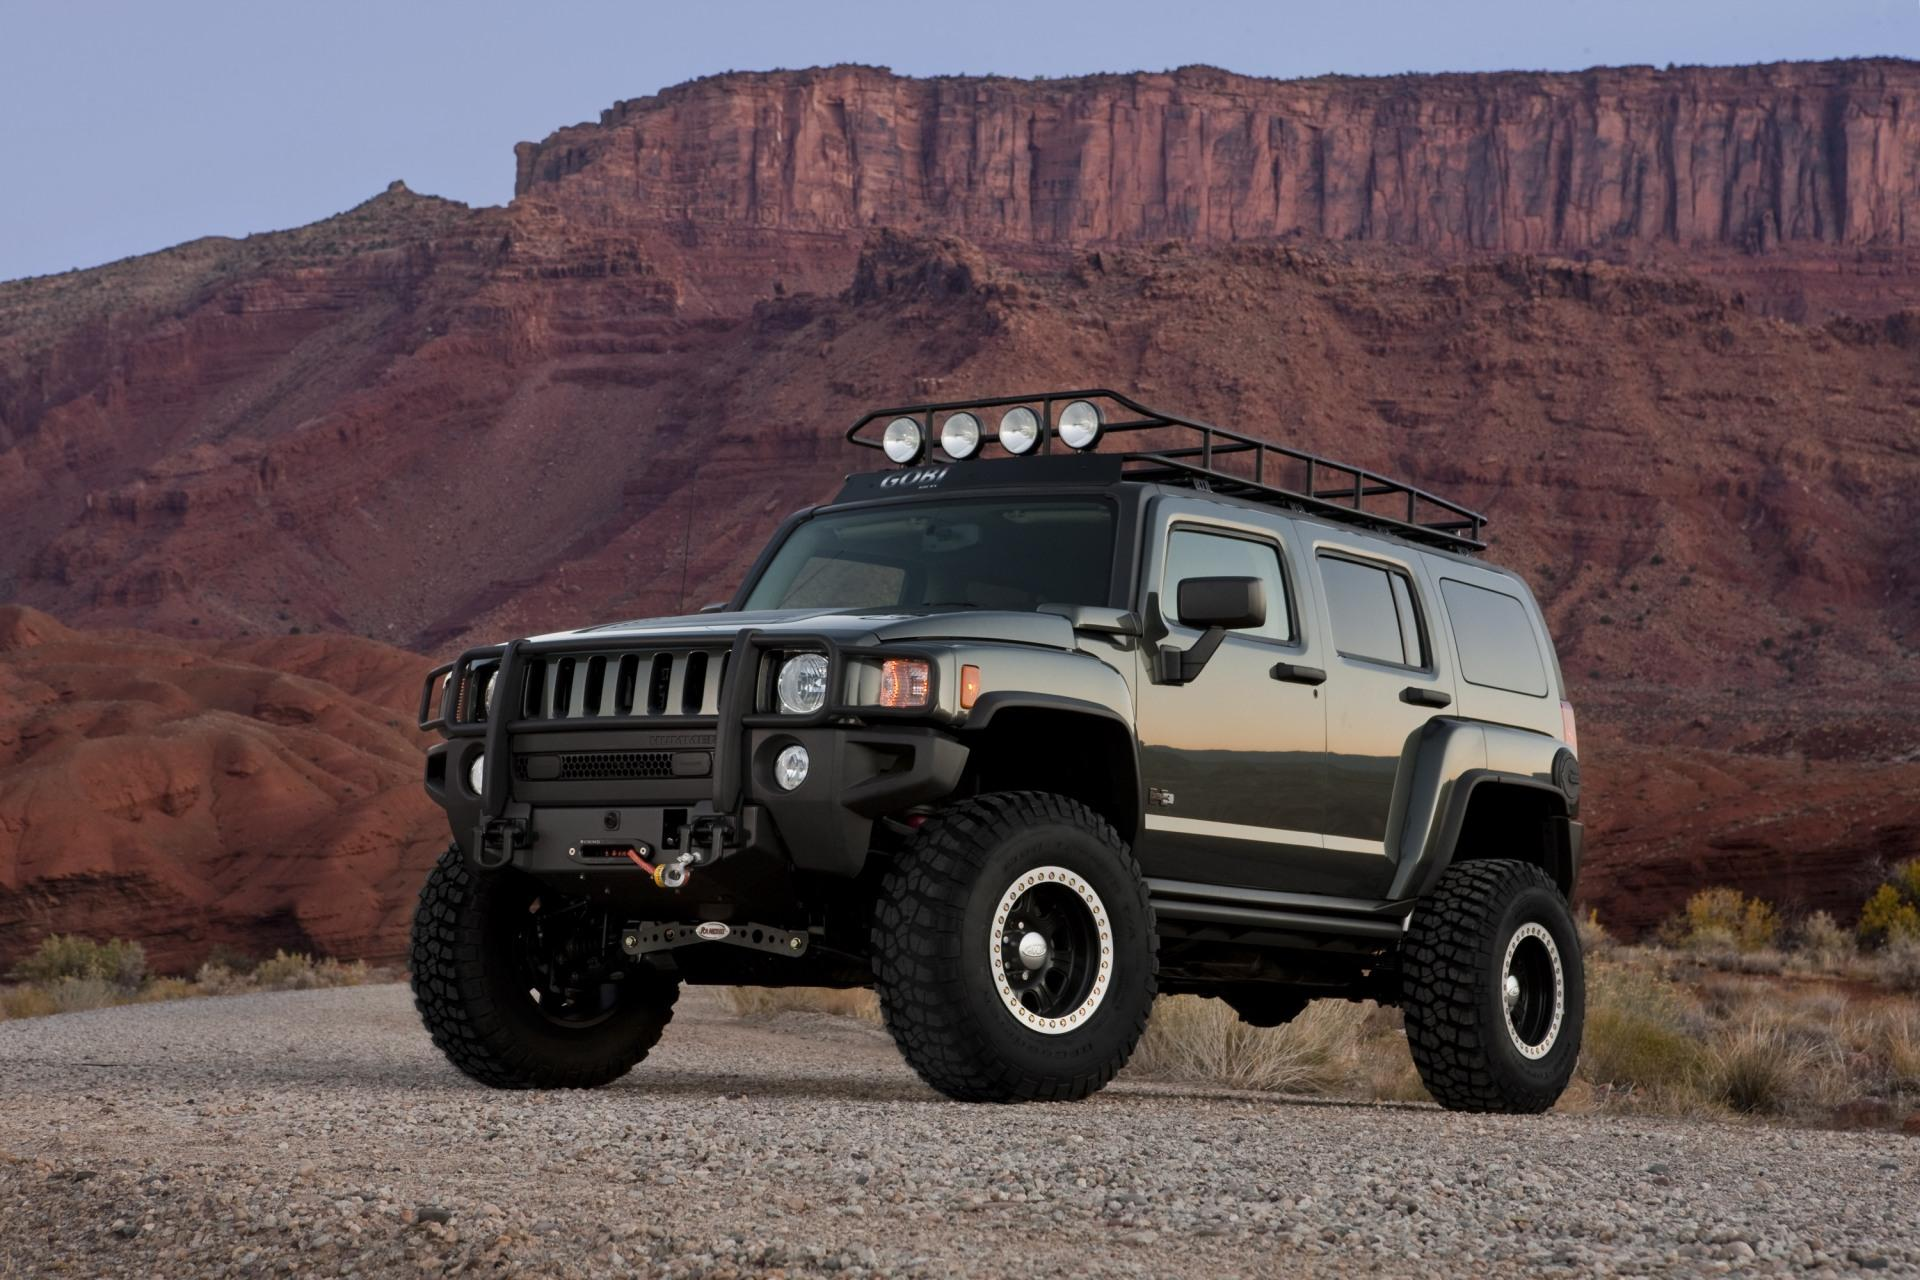 2010 Hummer H3 Moab conceptcarz